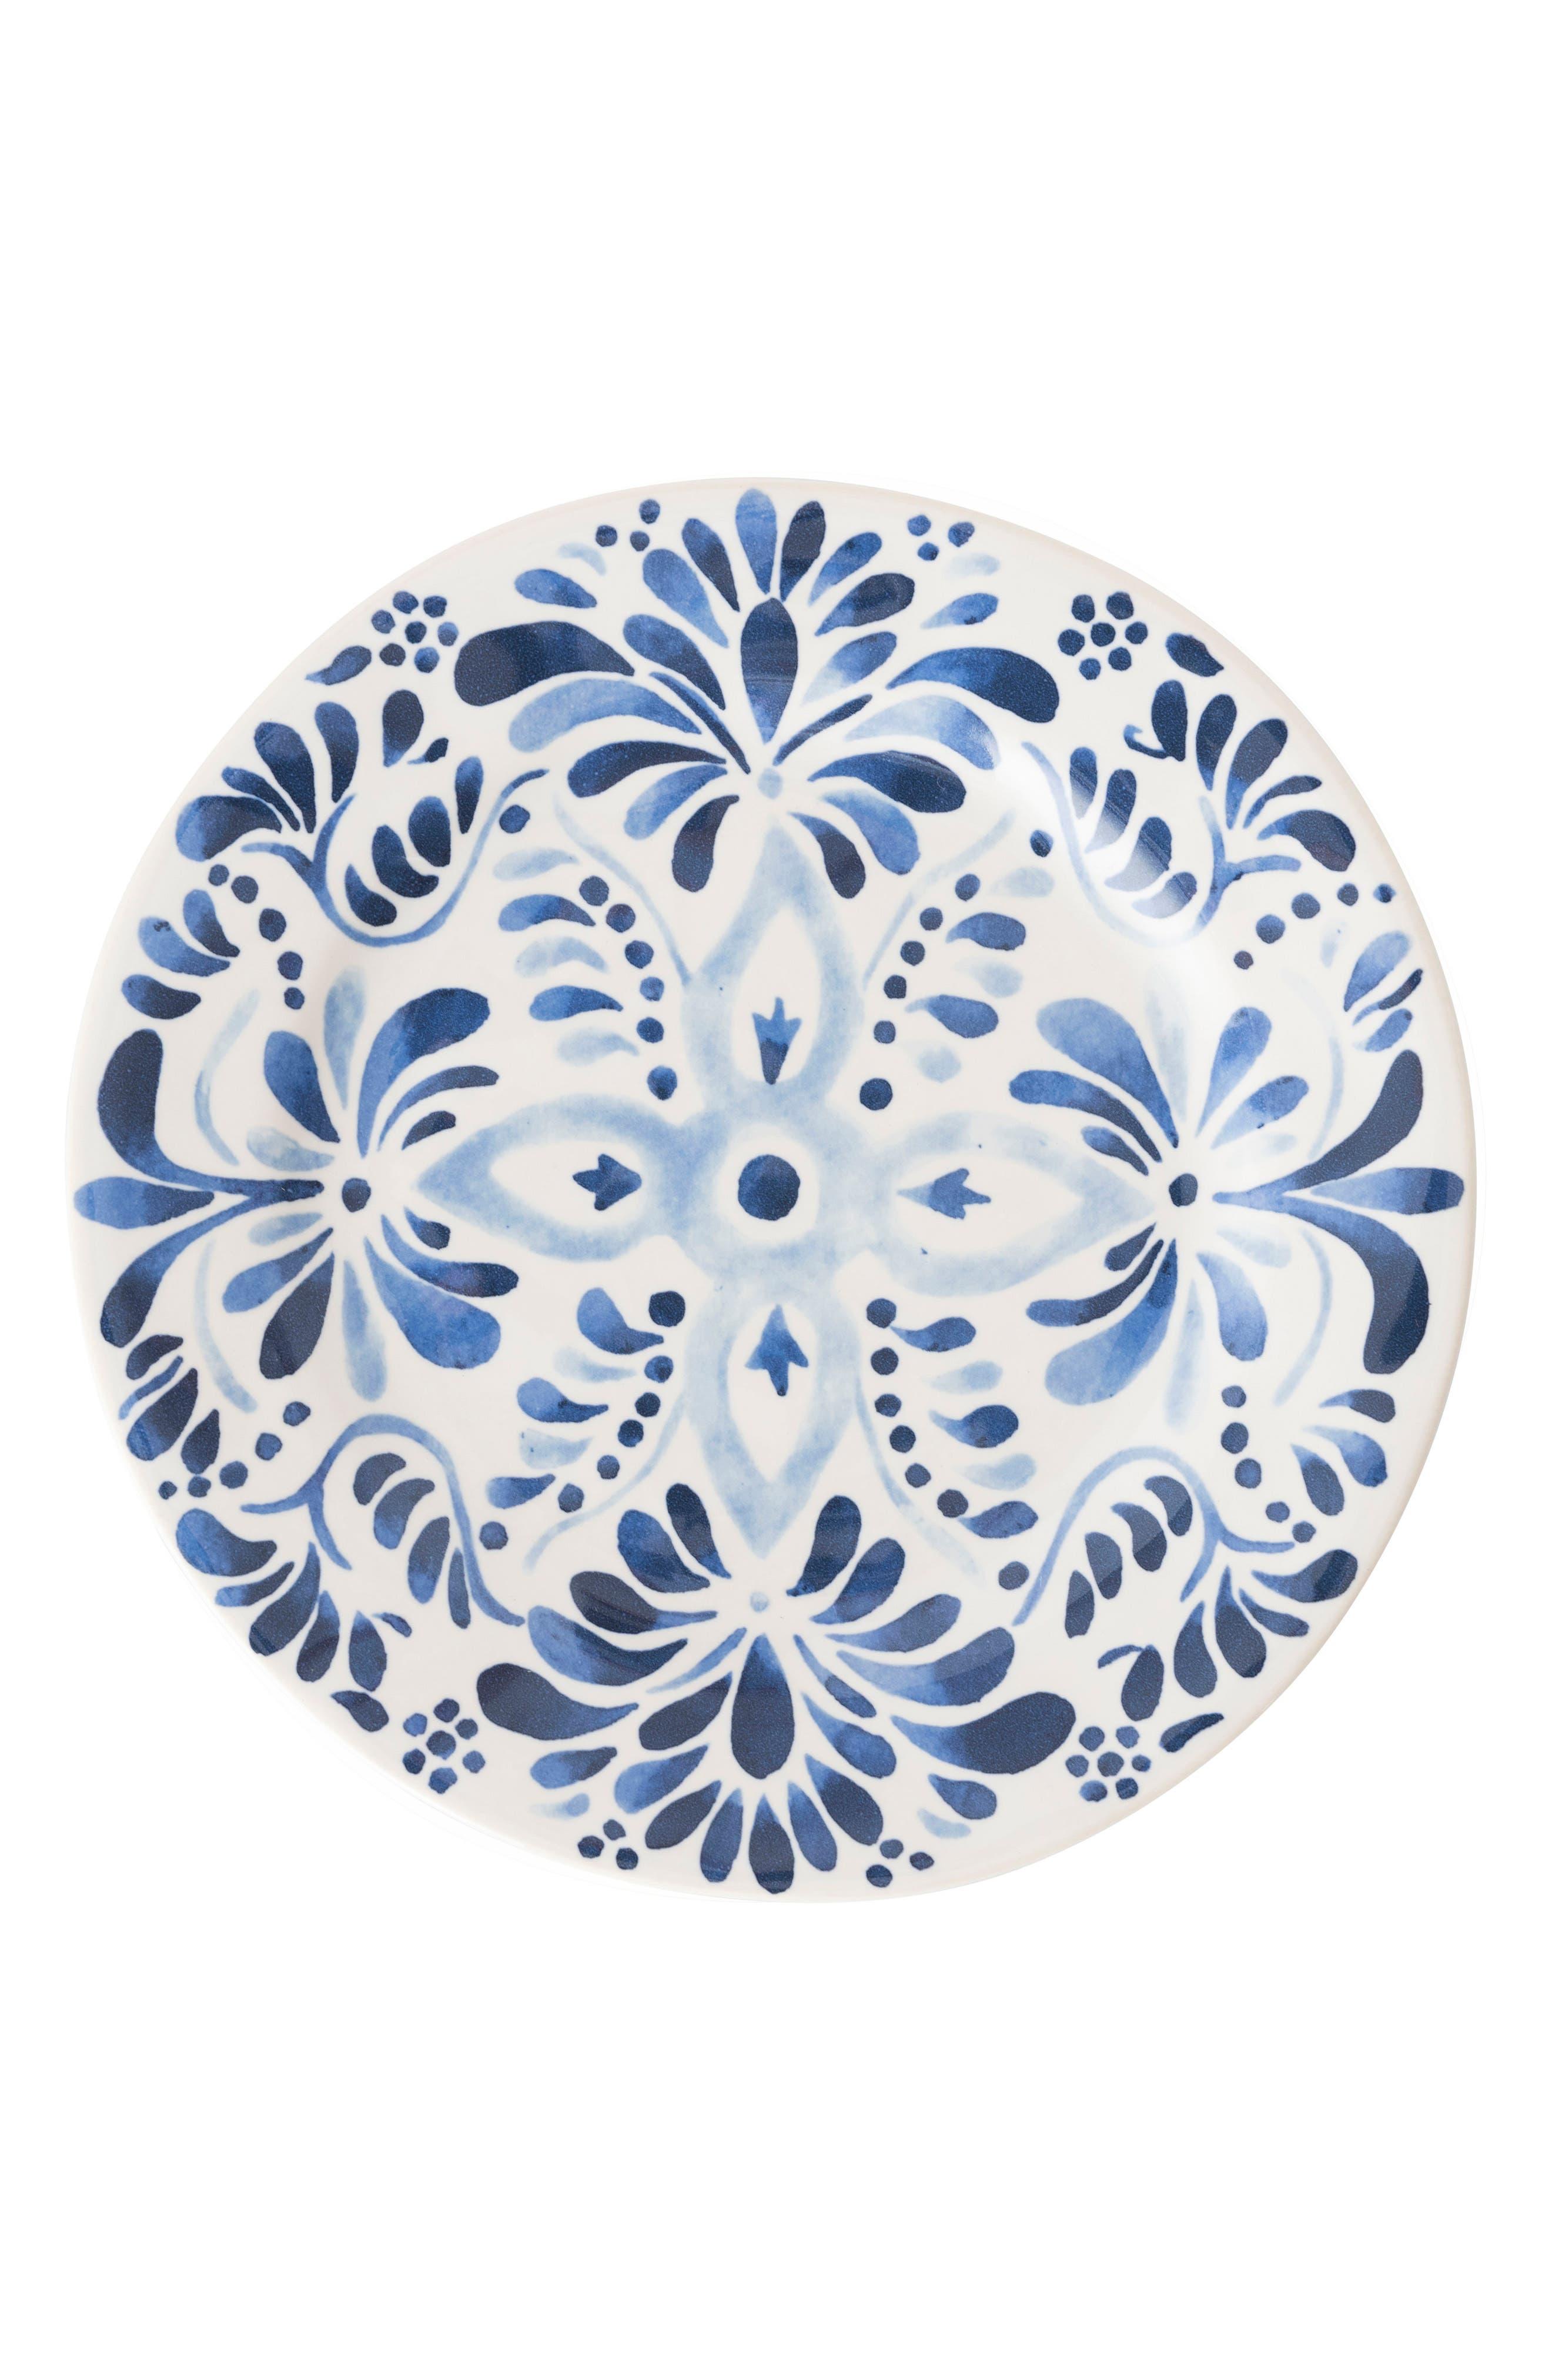 Main Image - Juliska Wanderlust Collection - Iberian Journey Ceramic Salad/Dessert Plate